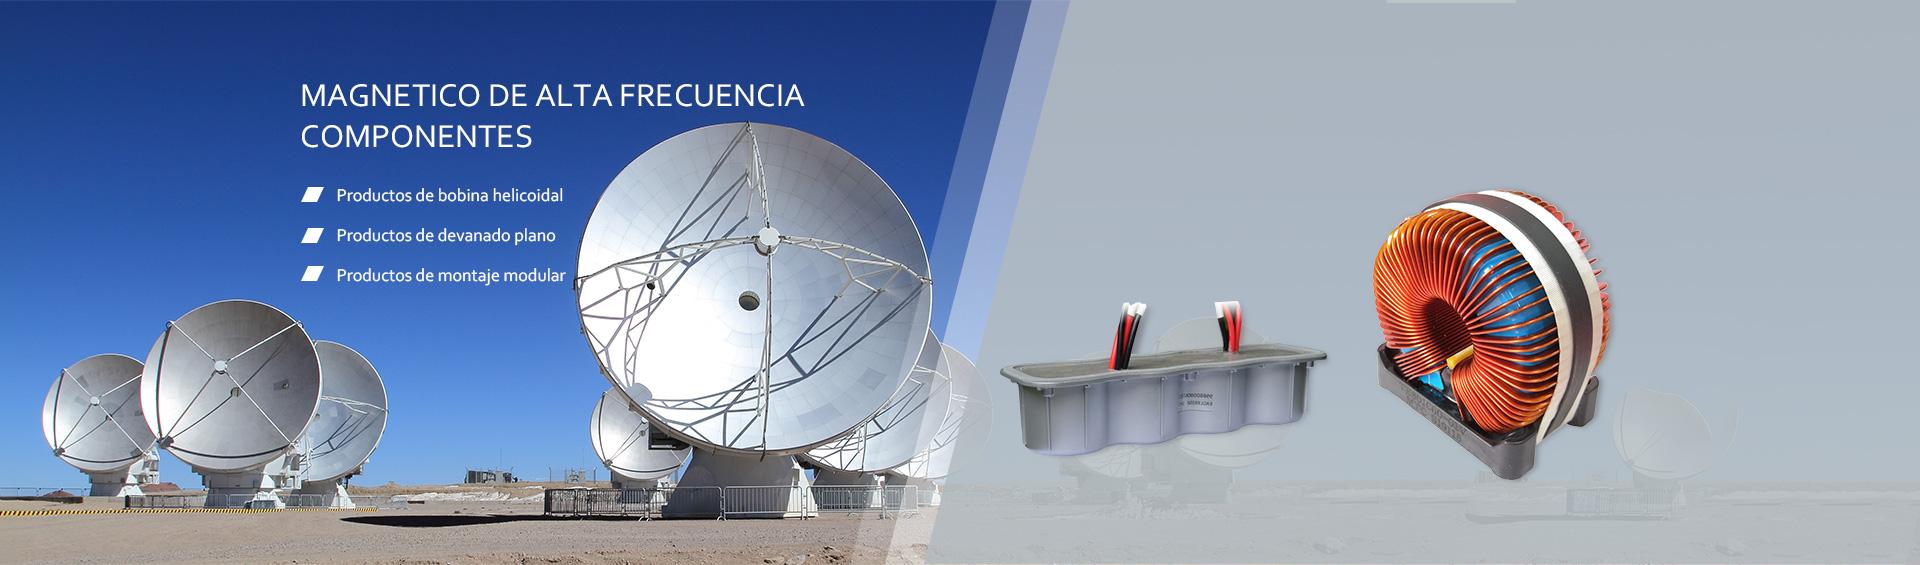 Transformador de alta frecuencia